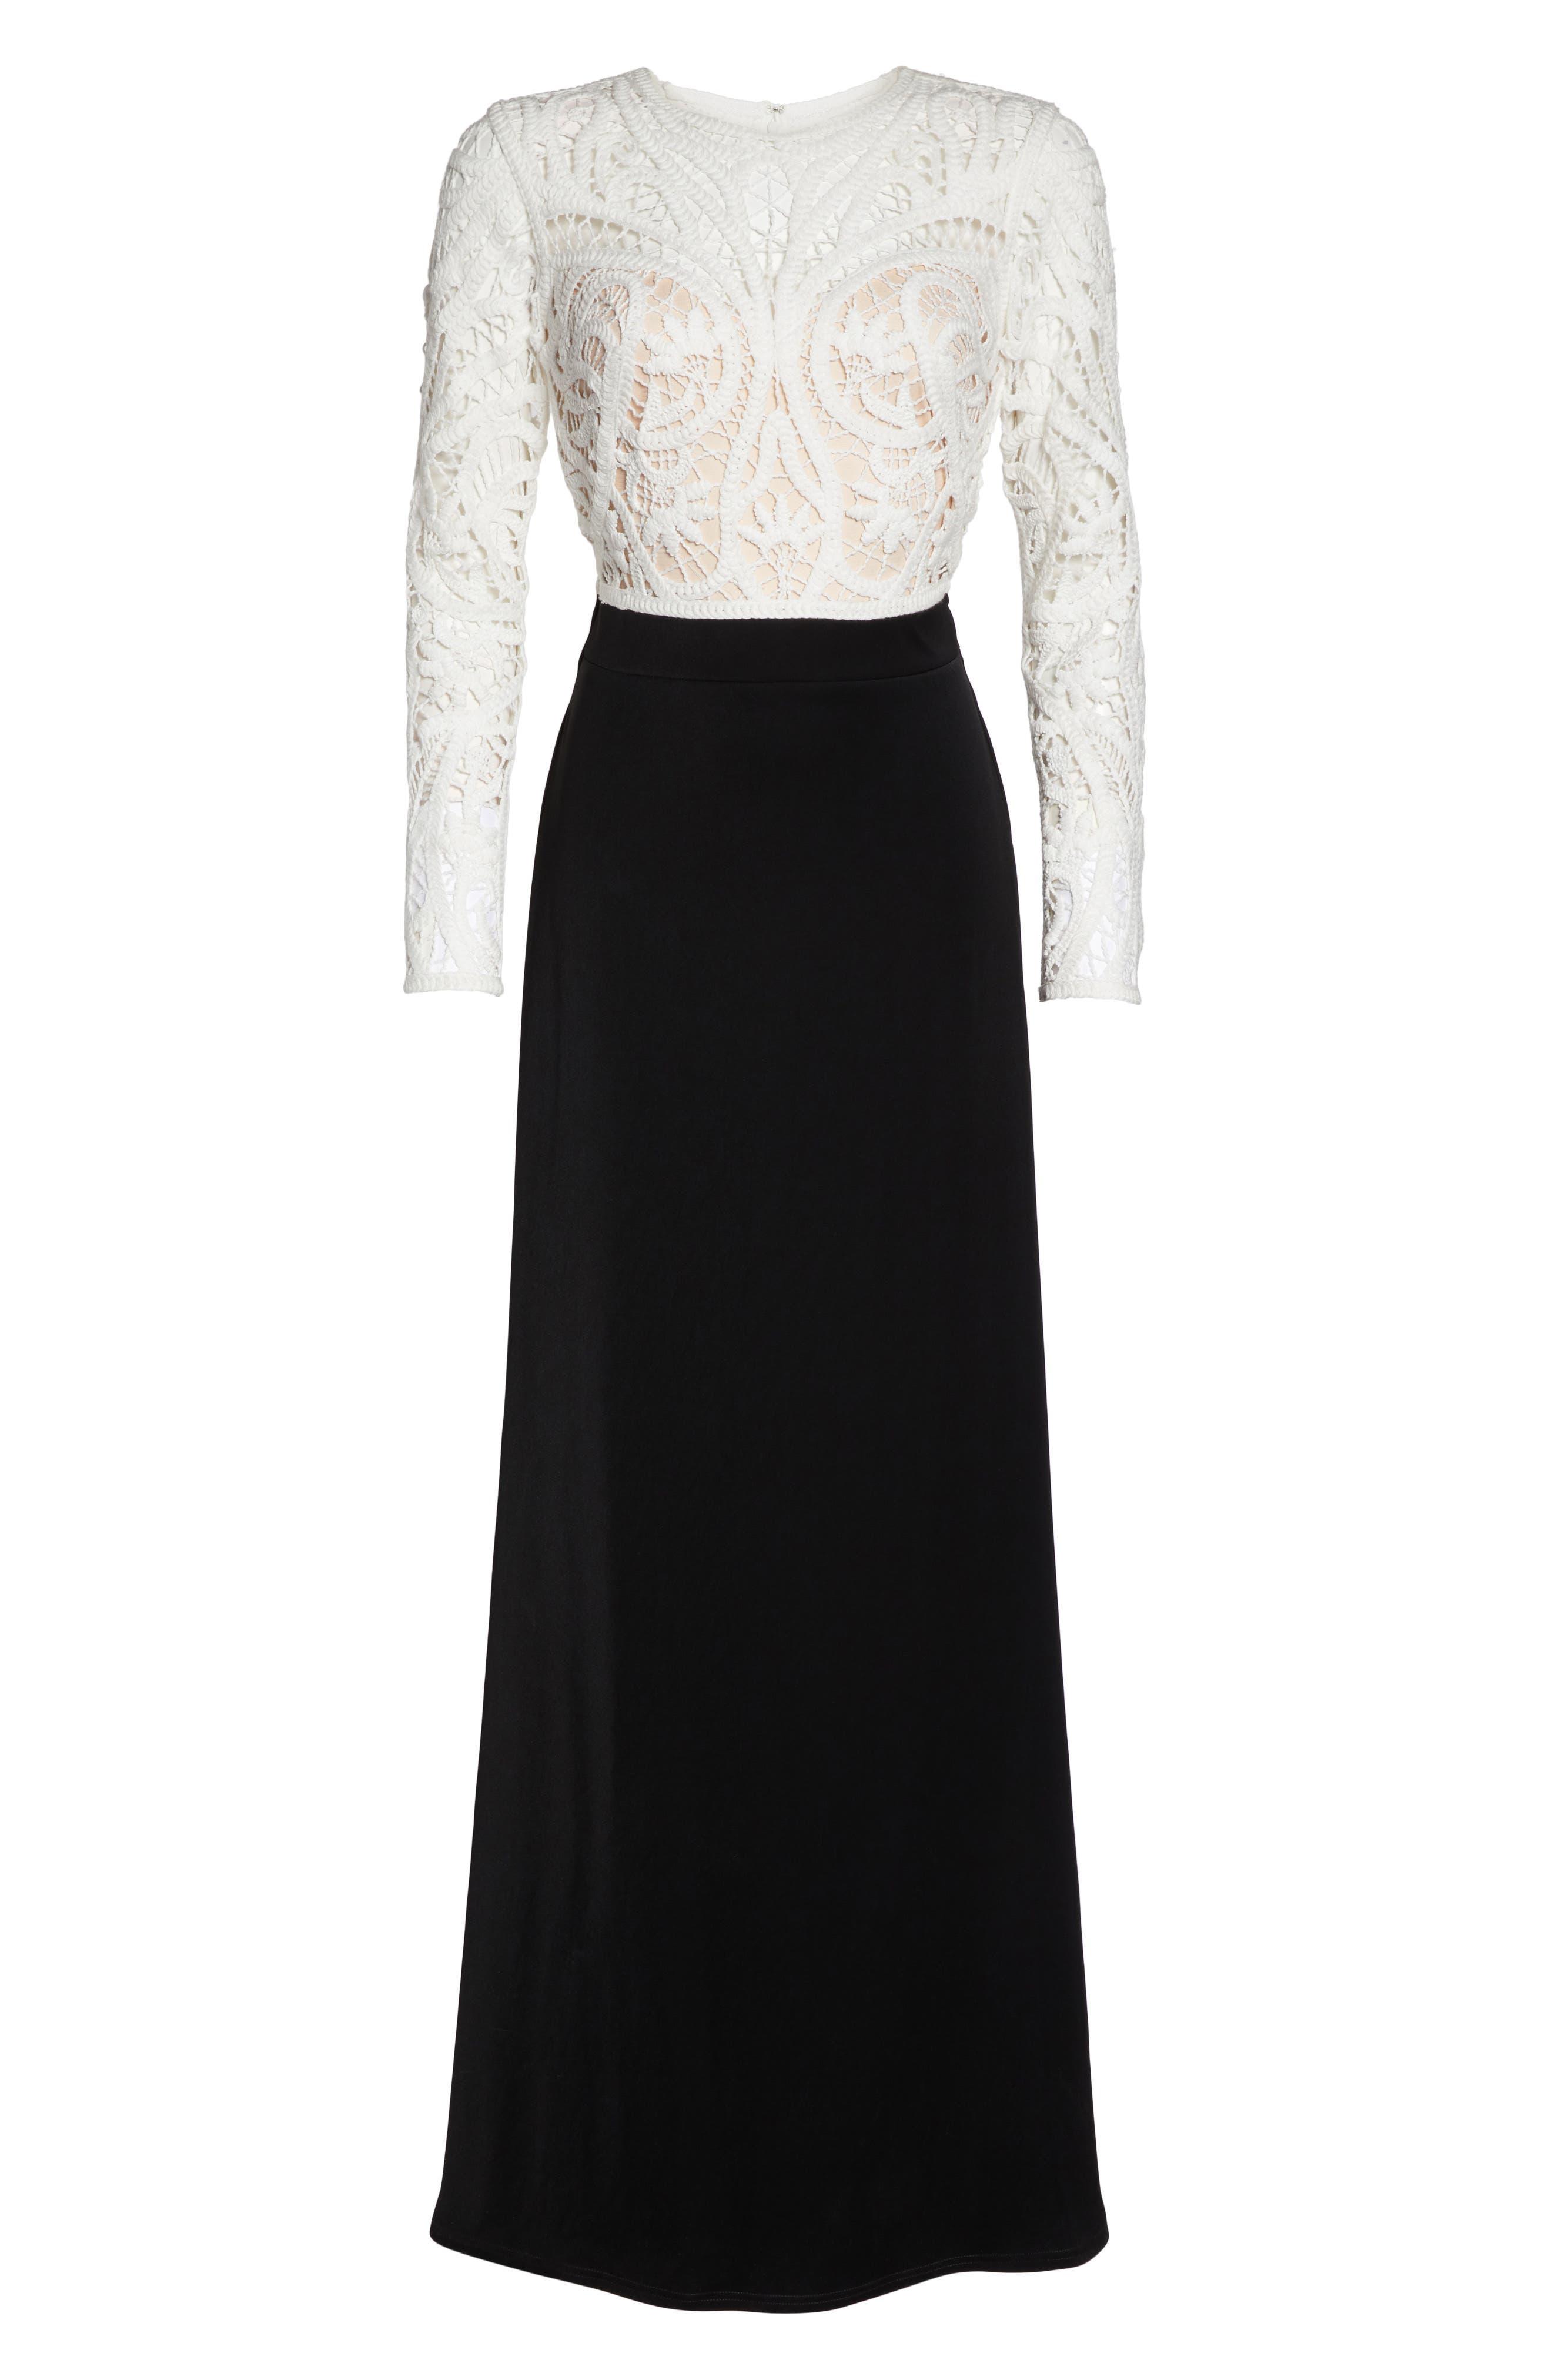 Crochet Lace & Crepe Gown,                             Alternate thumbnail 6, color,                             Ivory/ Black